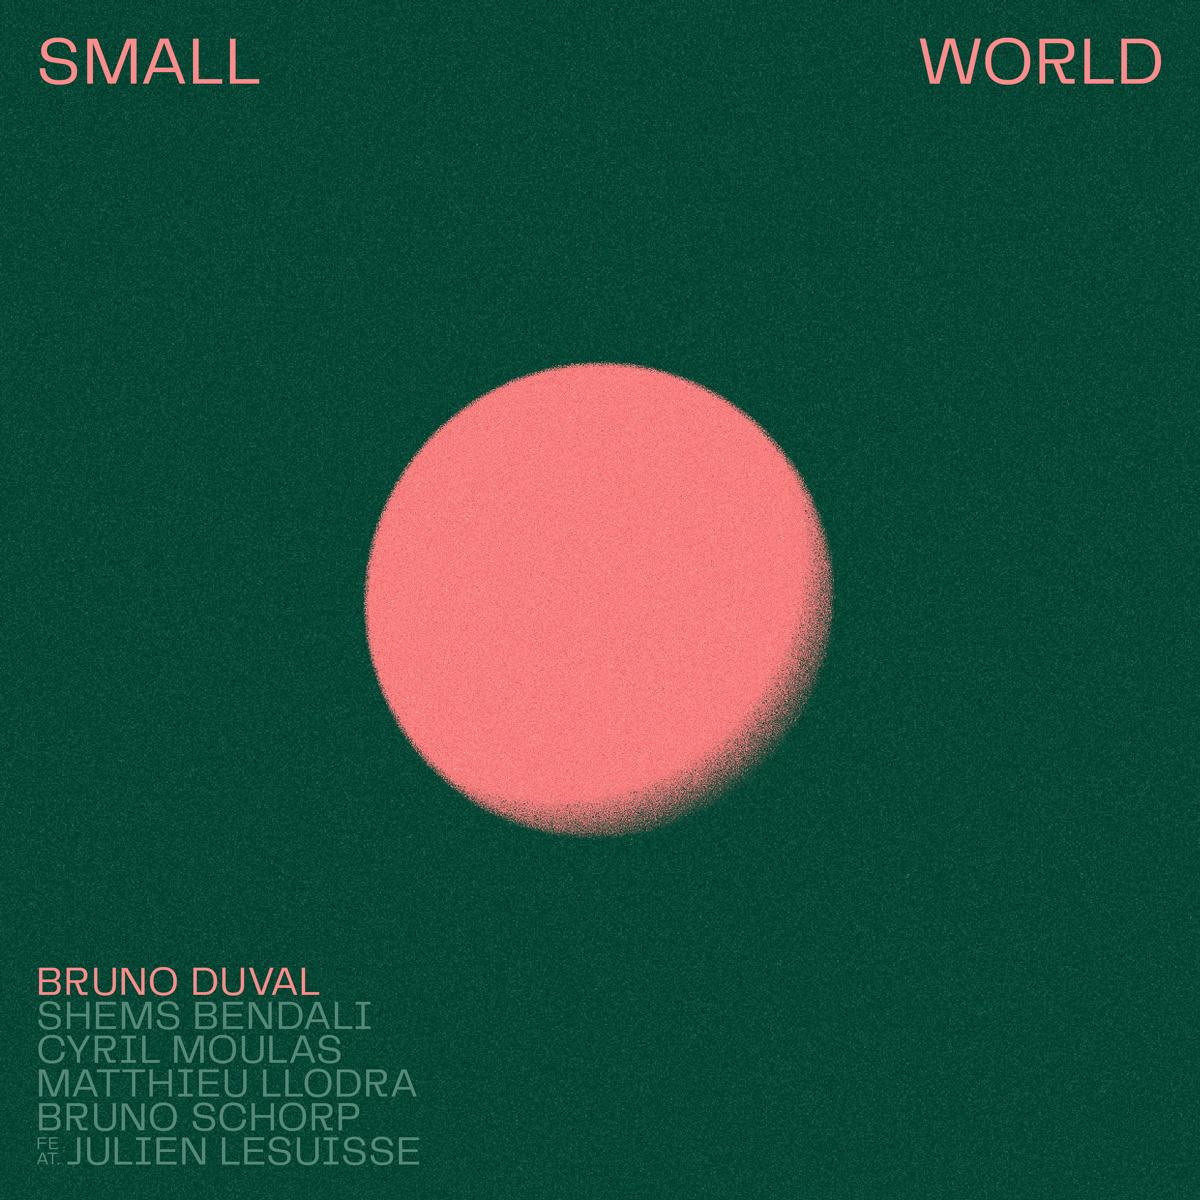 Small World - Album